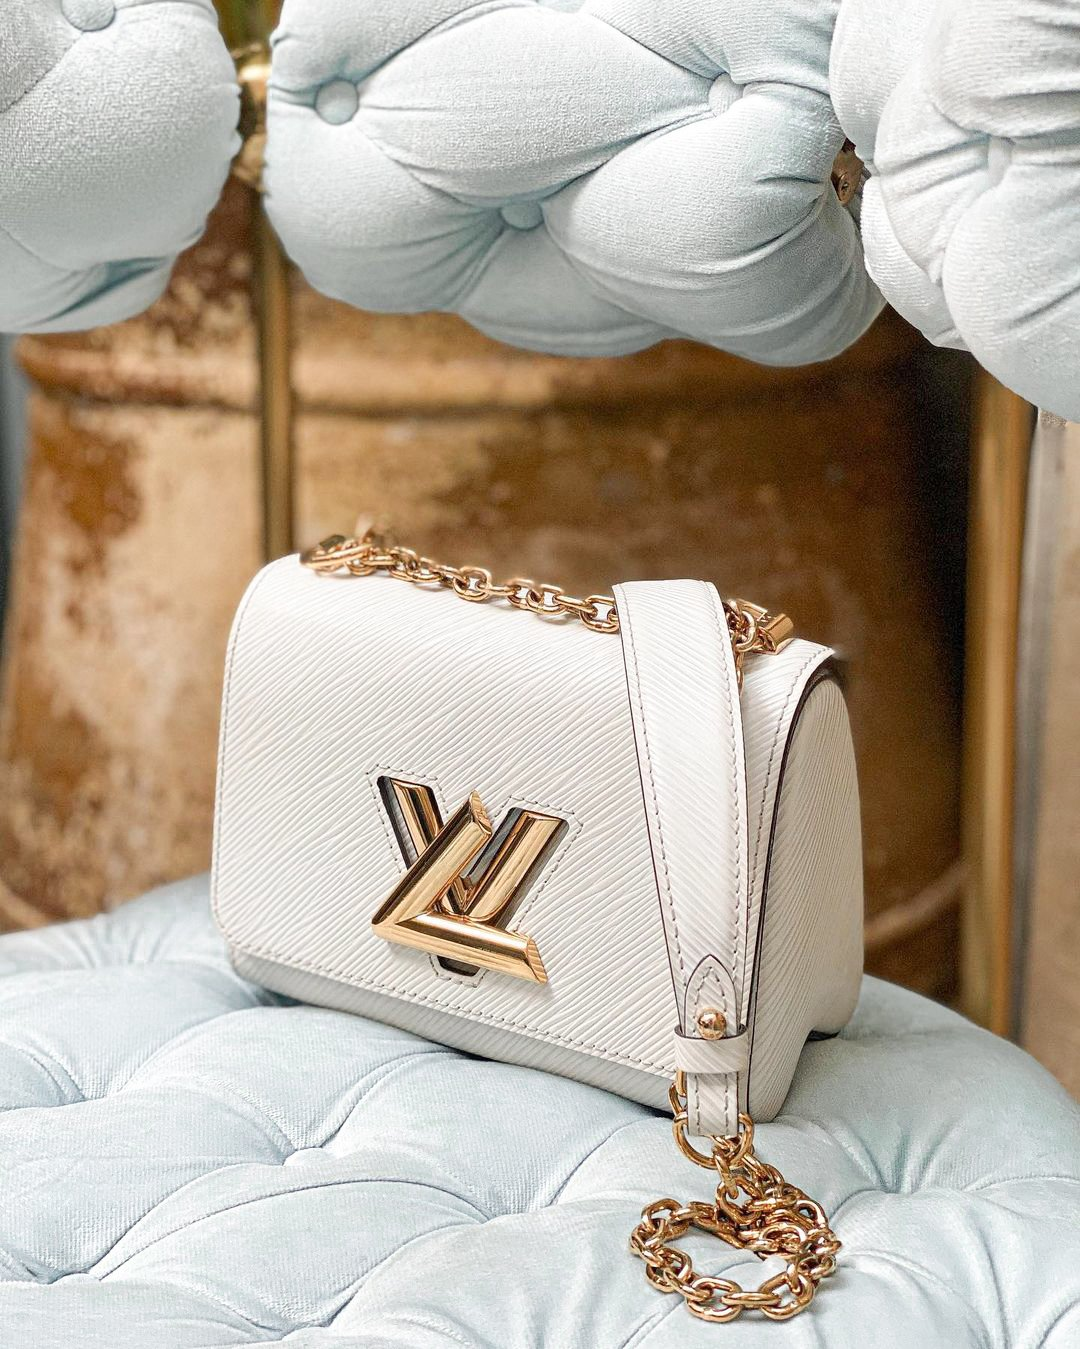 White Louis Vuitton twist bag